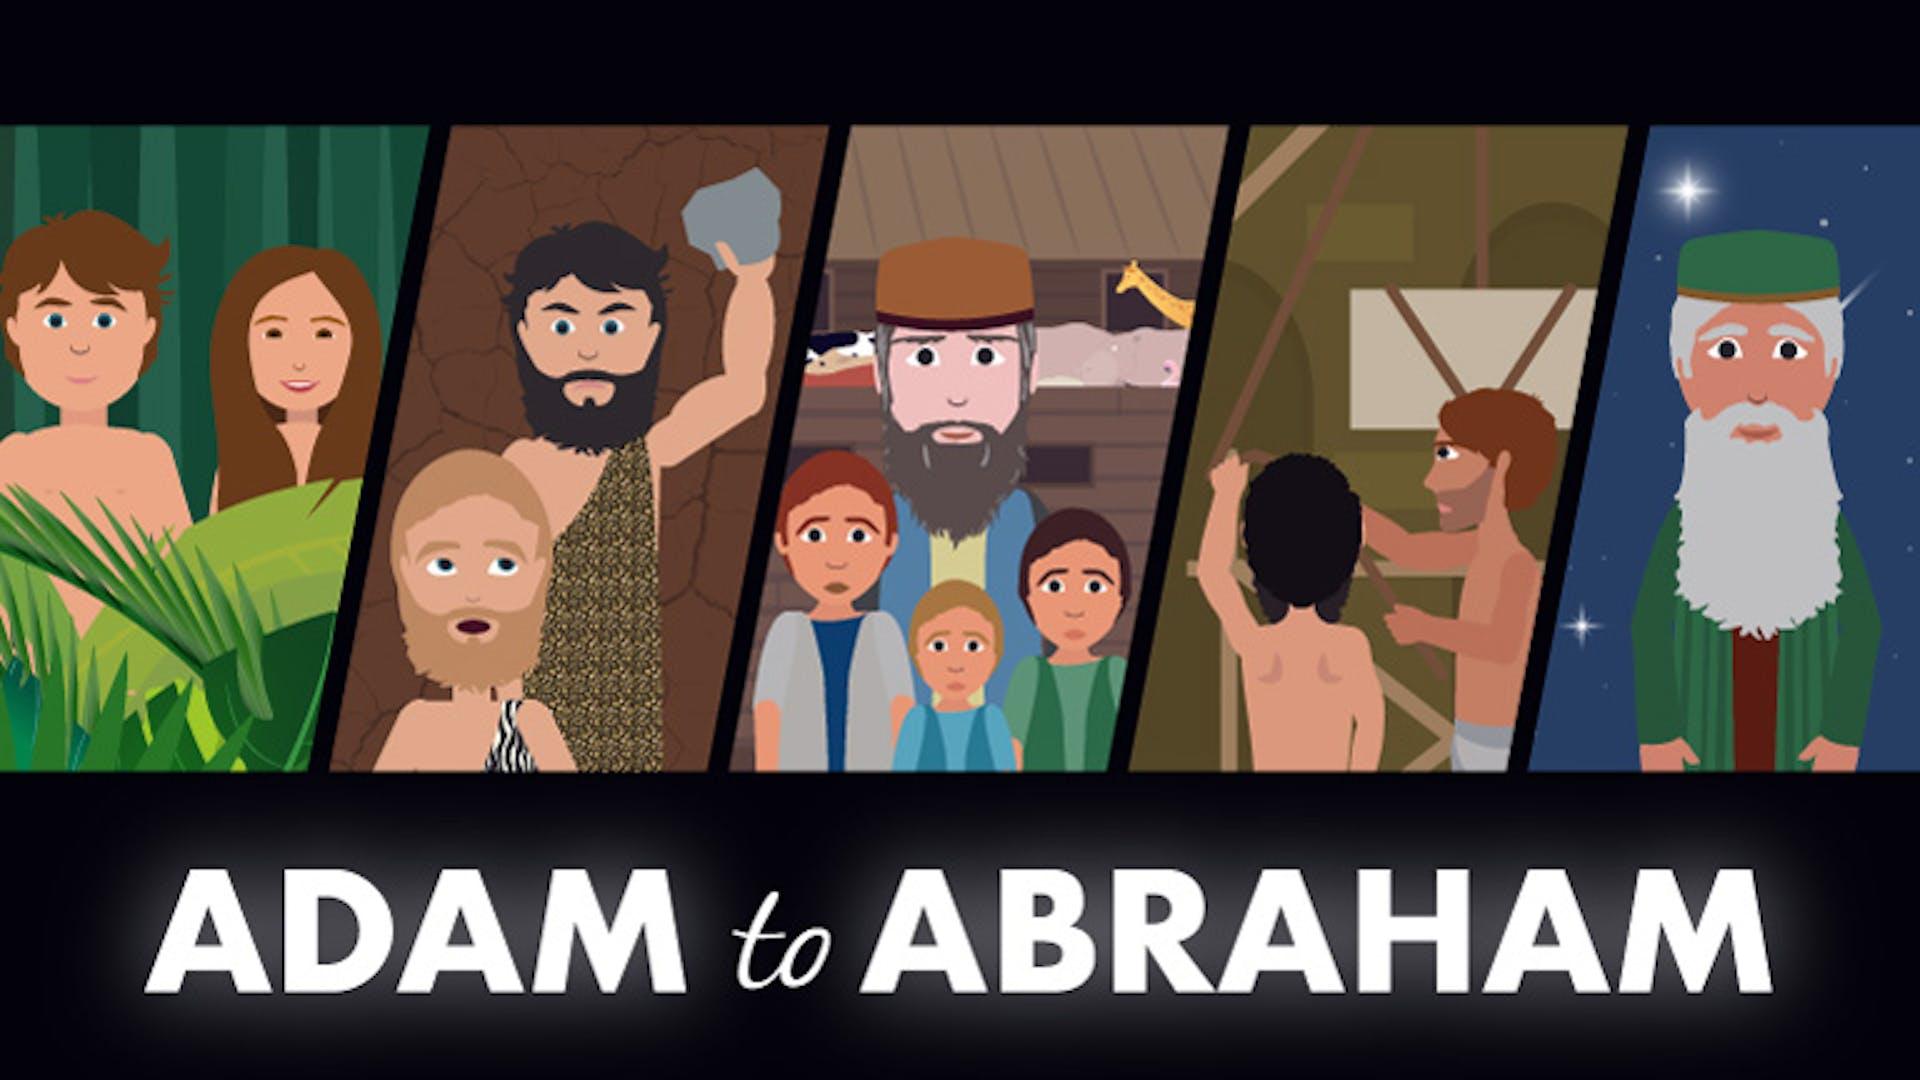 Adam to Abraham Genesis